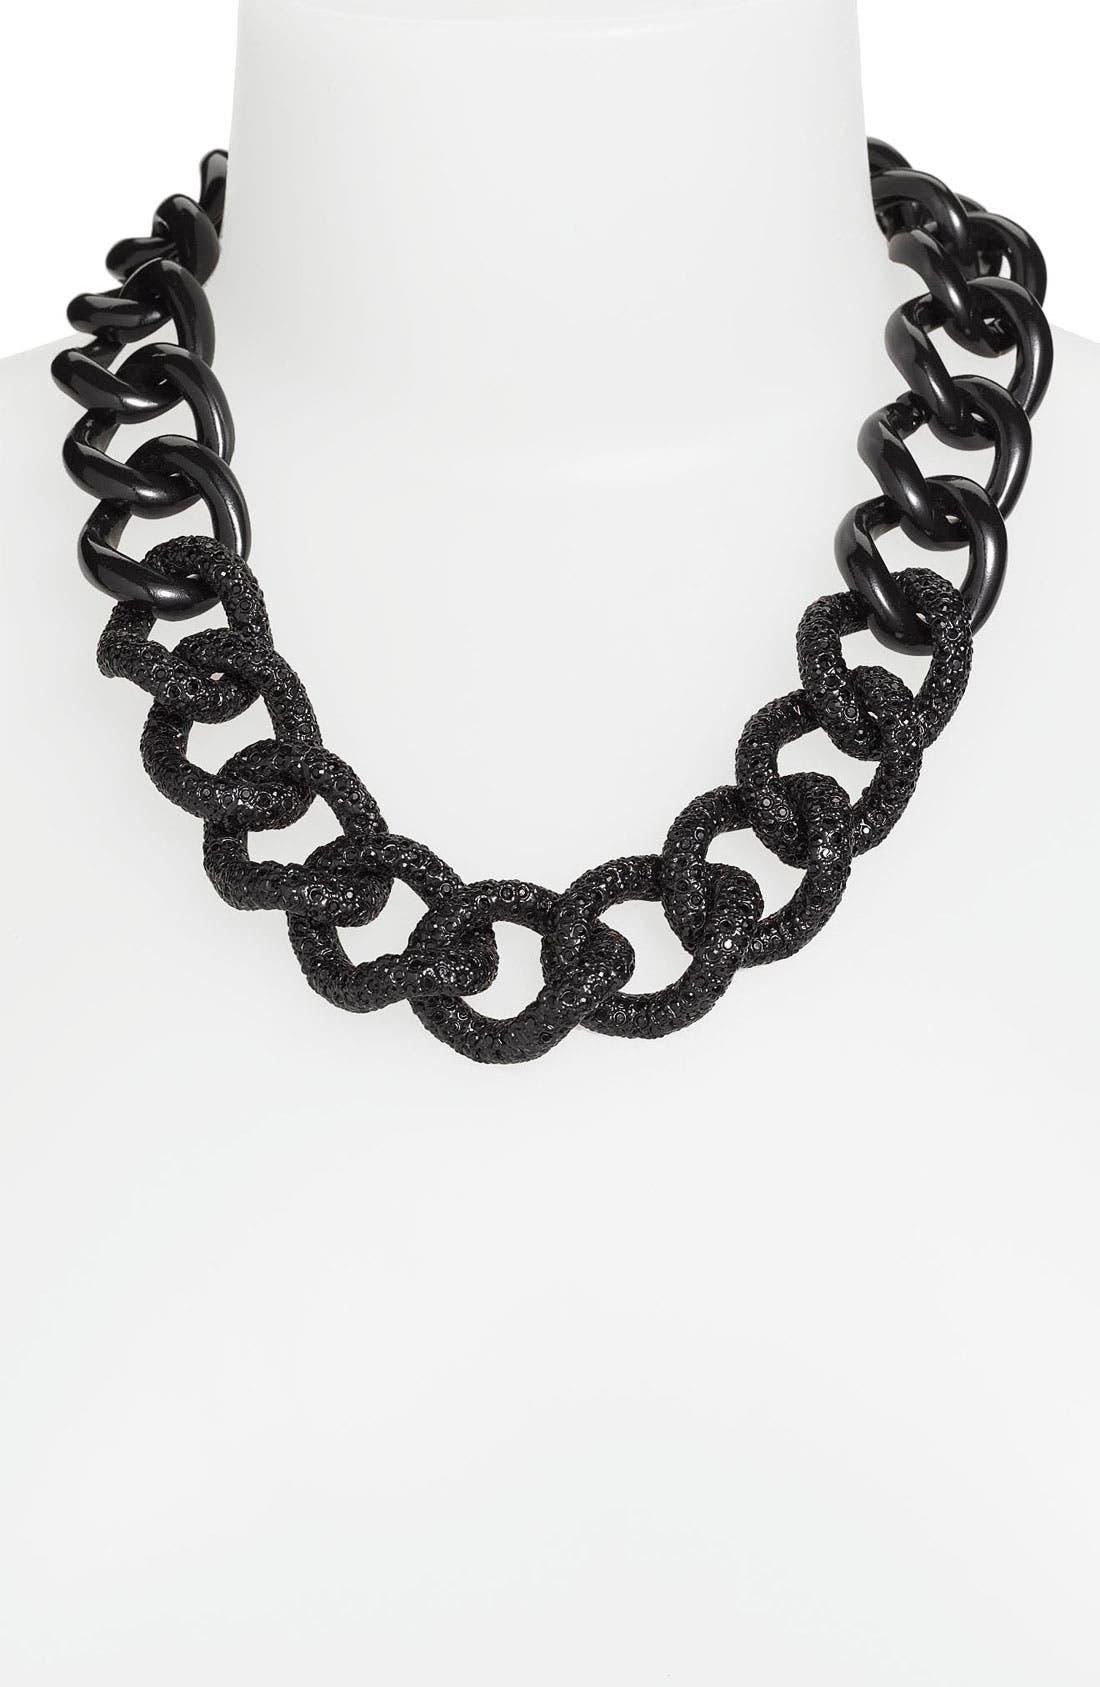 Alternate Image 1 Selected - St. John Collection 'Black Clad' Pavé Chain Necklace